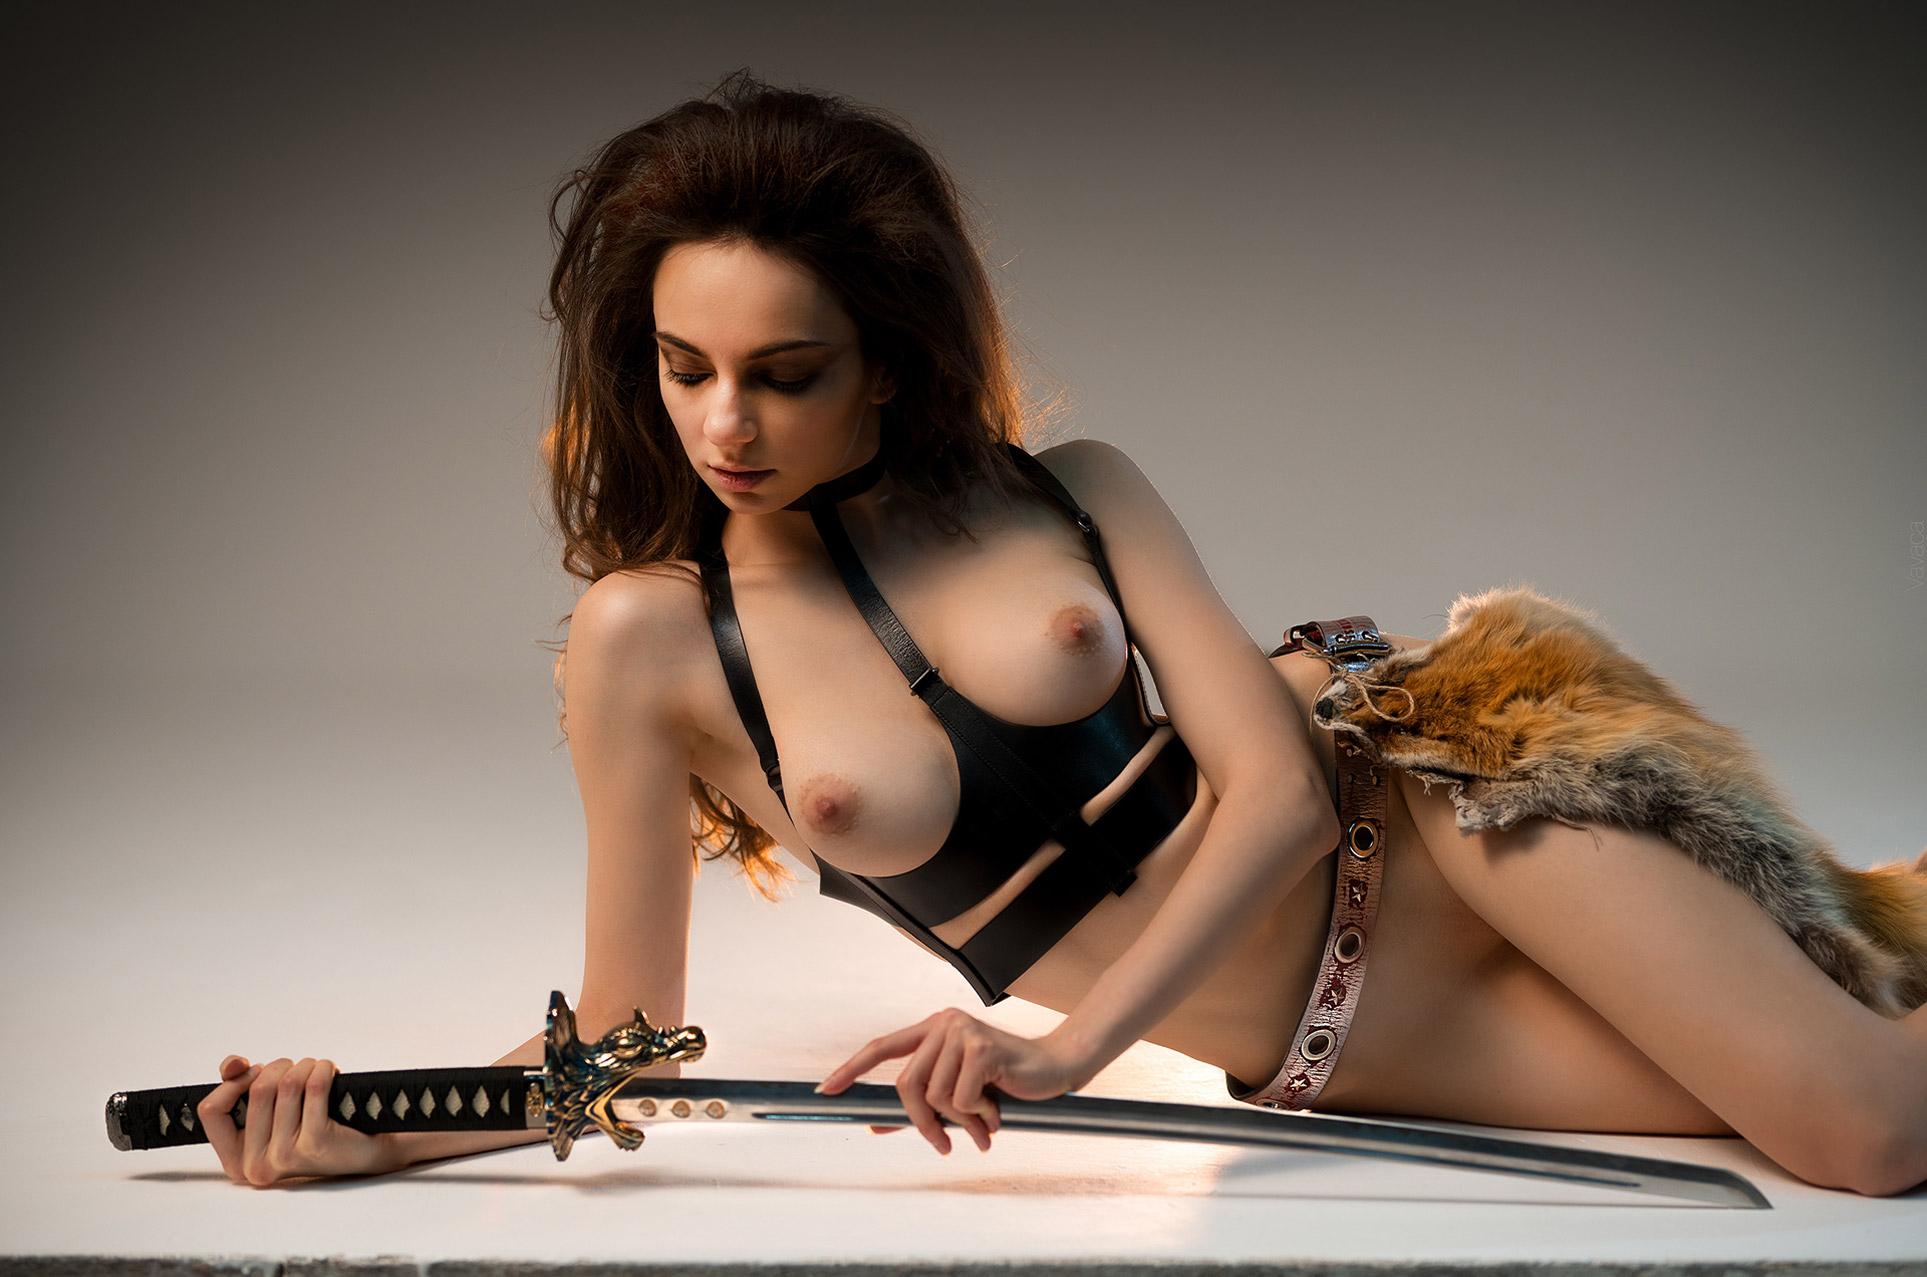 Марго Амп / Margo Amp nude by Vladimir Nikolaev / The Warrior